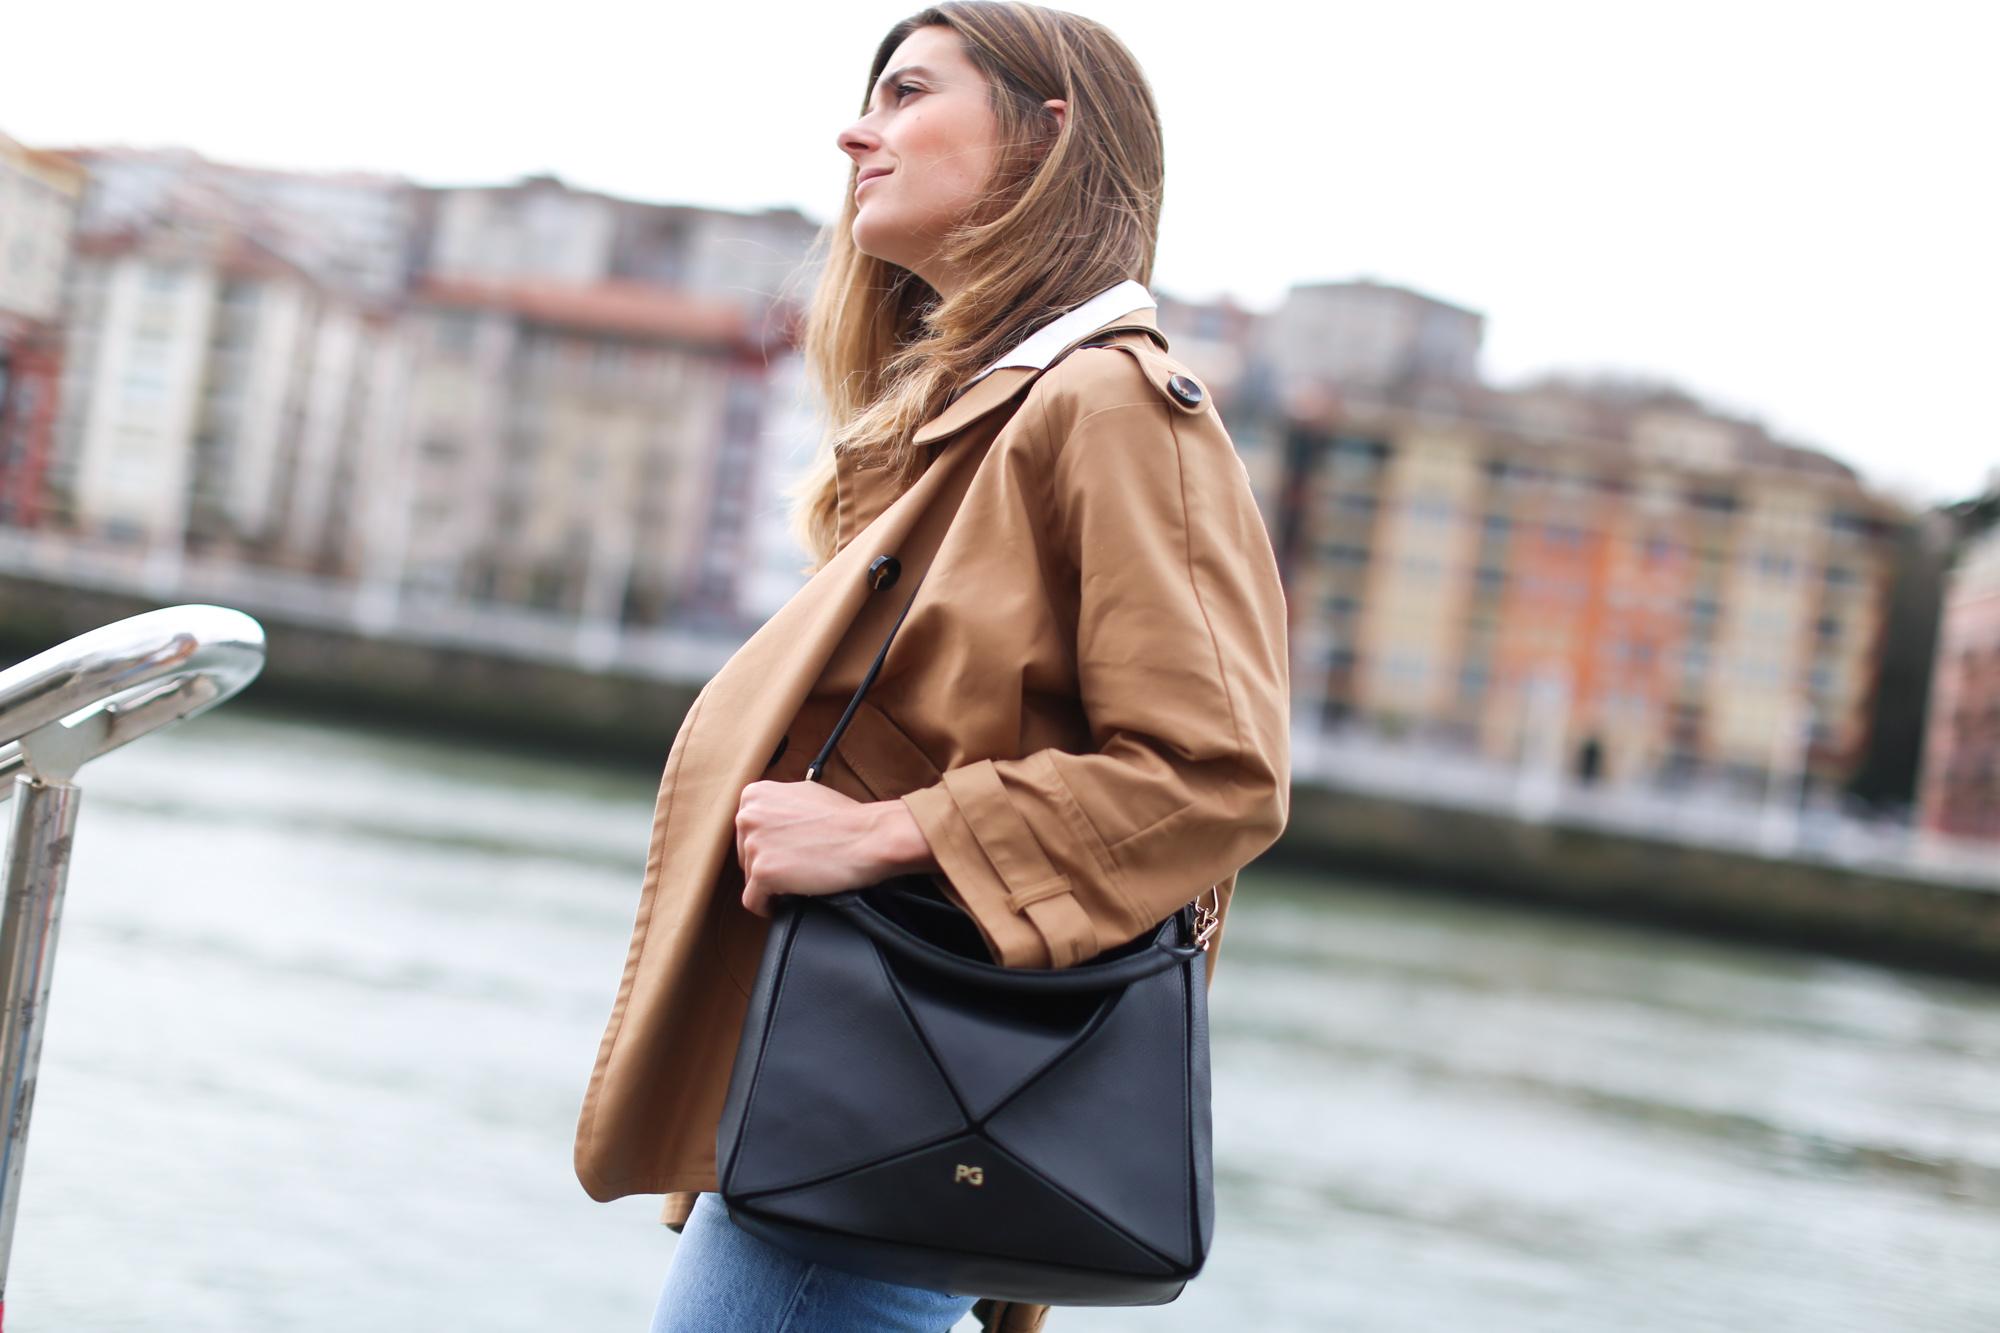 Clochet_streetstyle_fashionblogger_vintagehighwaistedjeans_purificaciongarciatangram_zapatosoxfordSandroParis-7